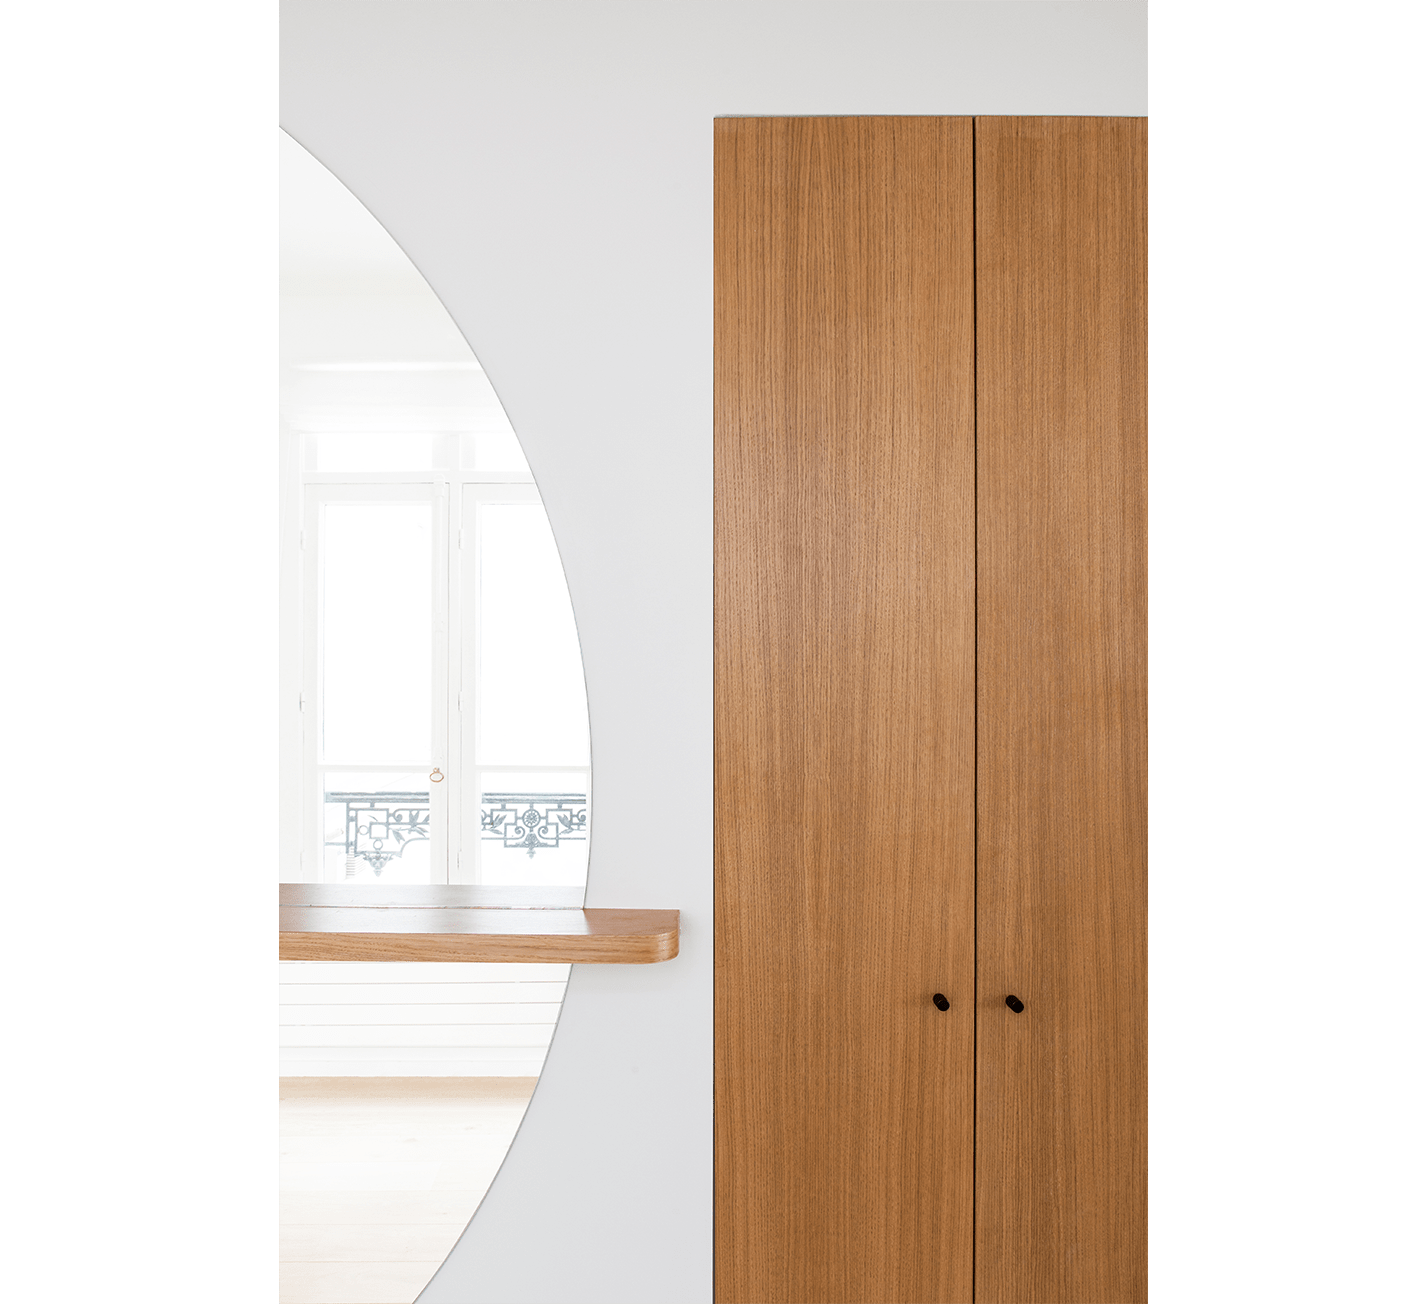 Projet-Arlequin-Atelier-Steve-Pauline-Borgia-Architecture-interieur-13-min